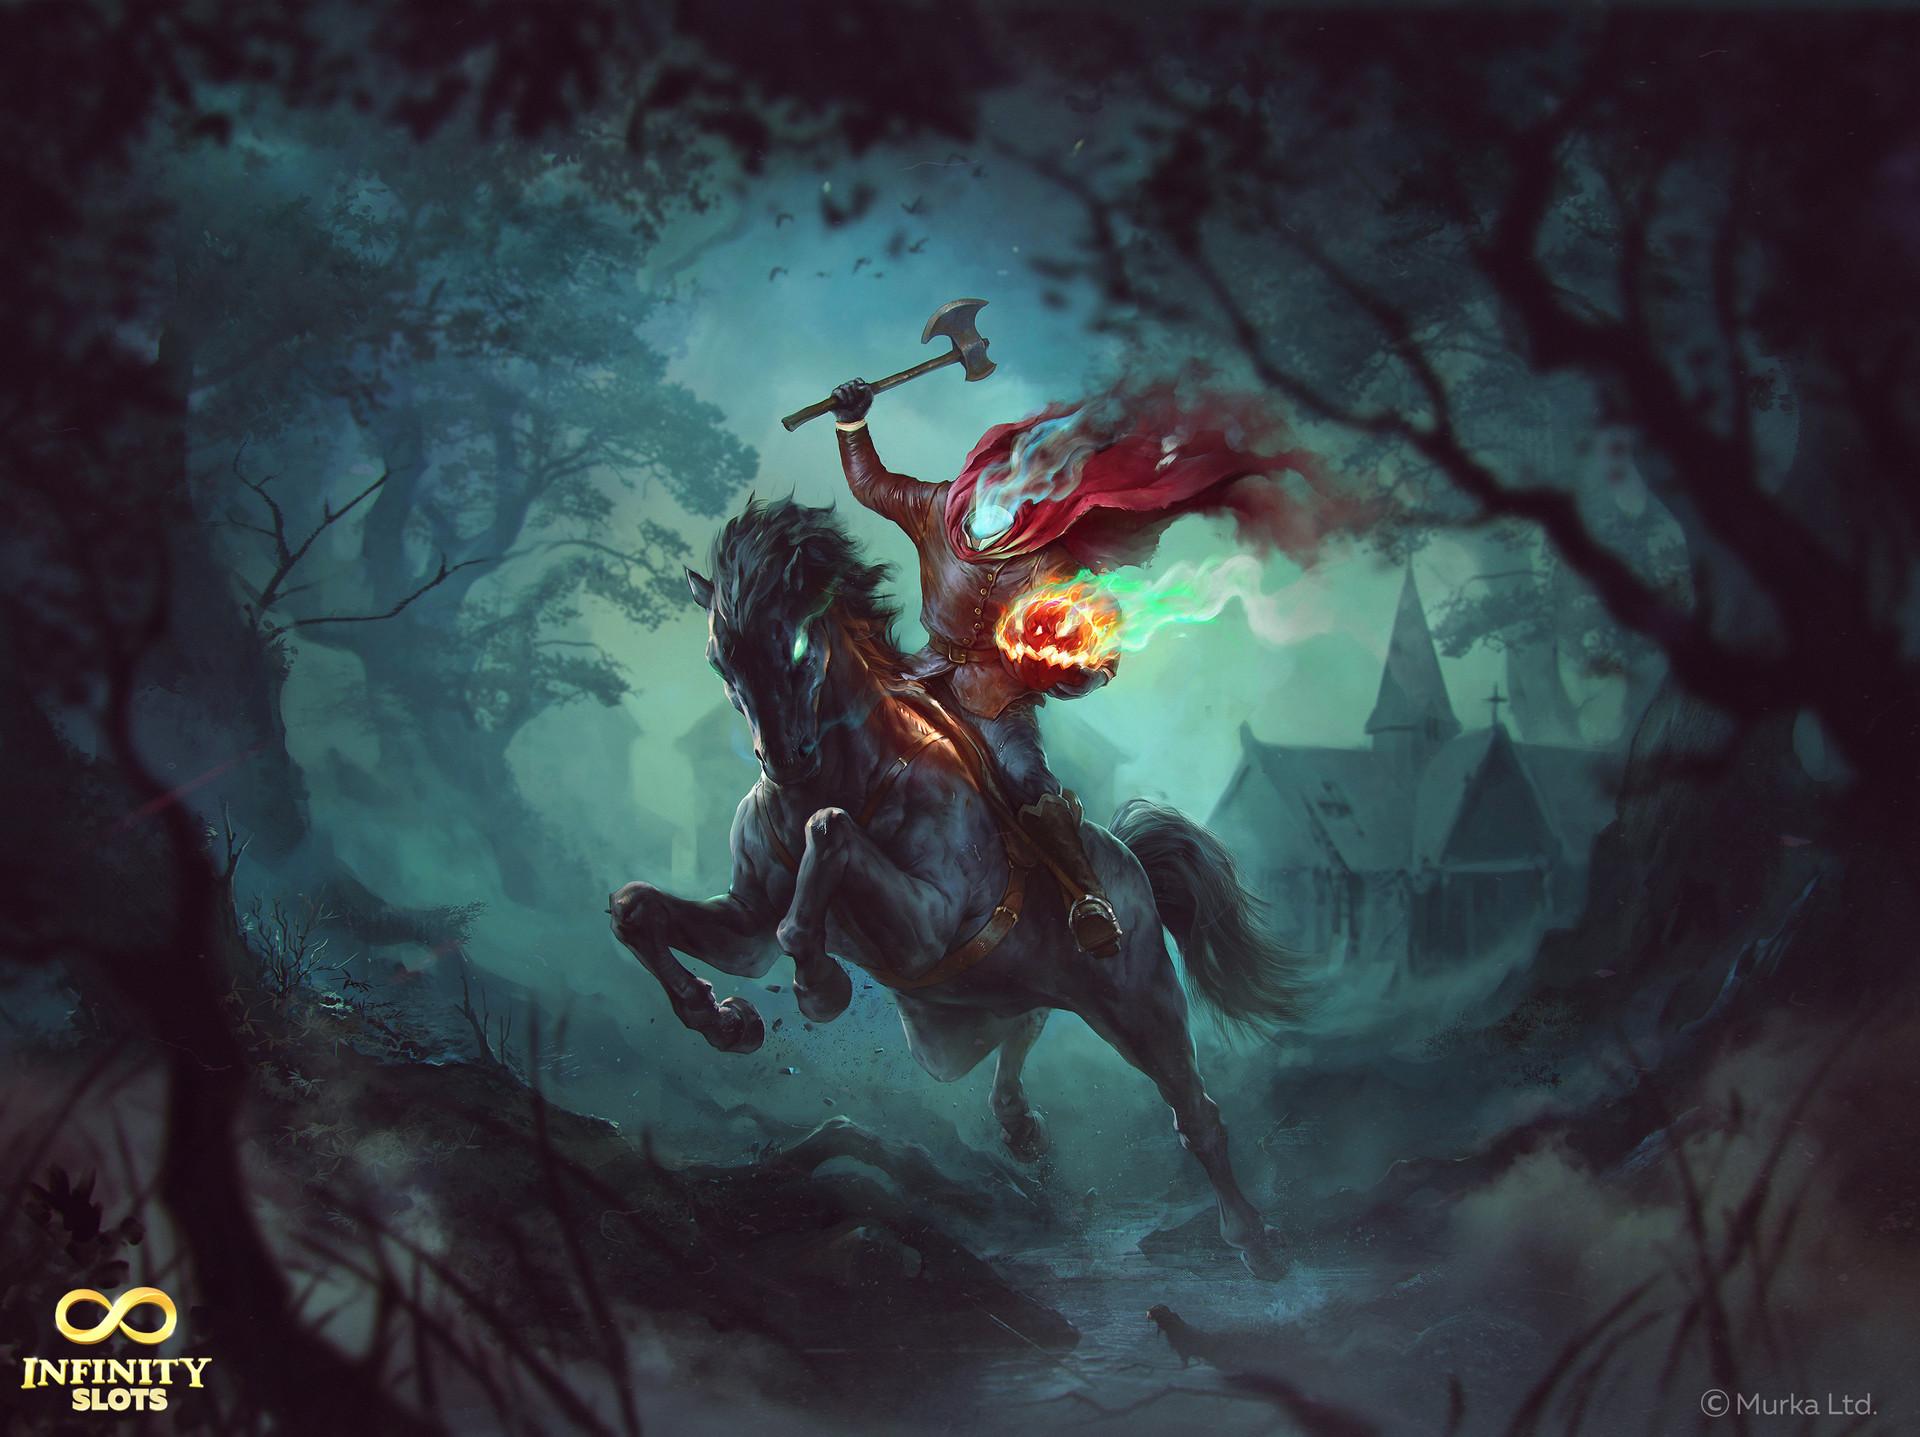 Artstation headless horseman denys tsiperko - Pictures of the headless horseman ...